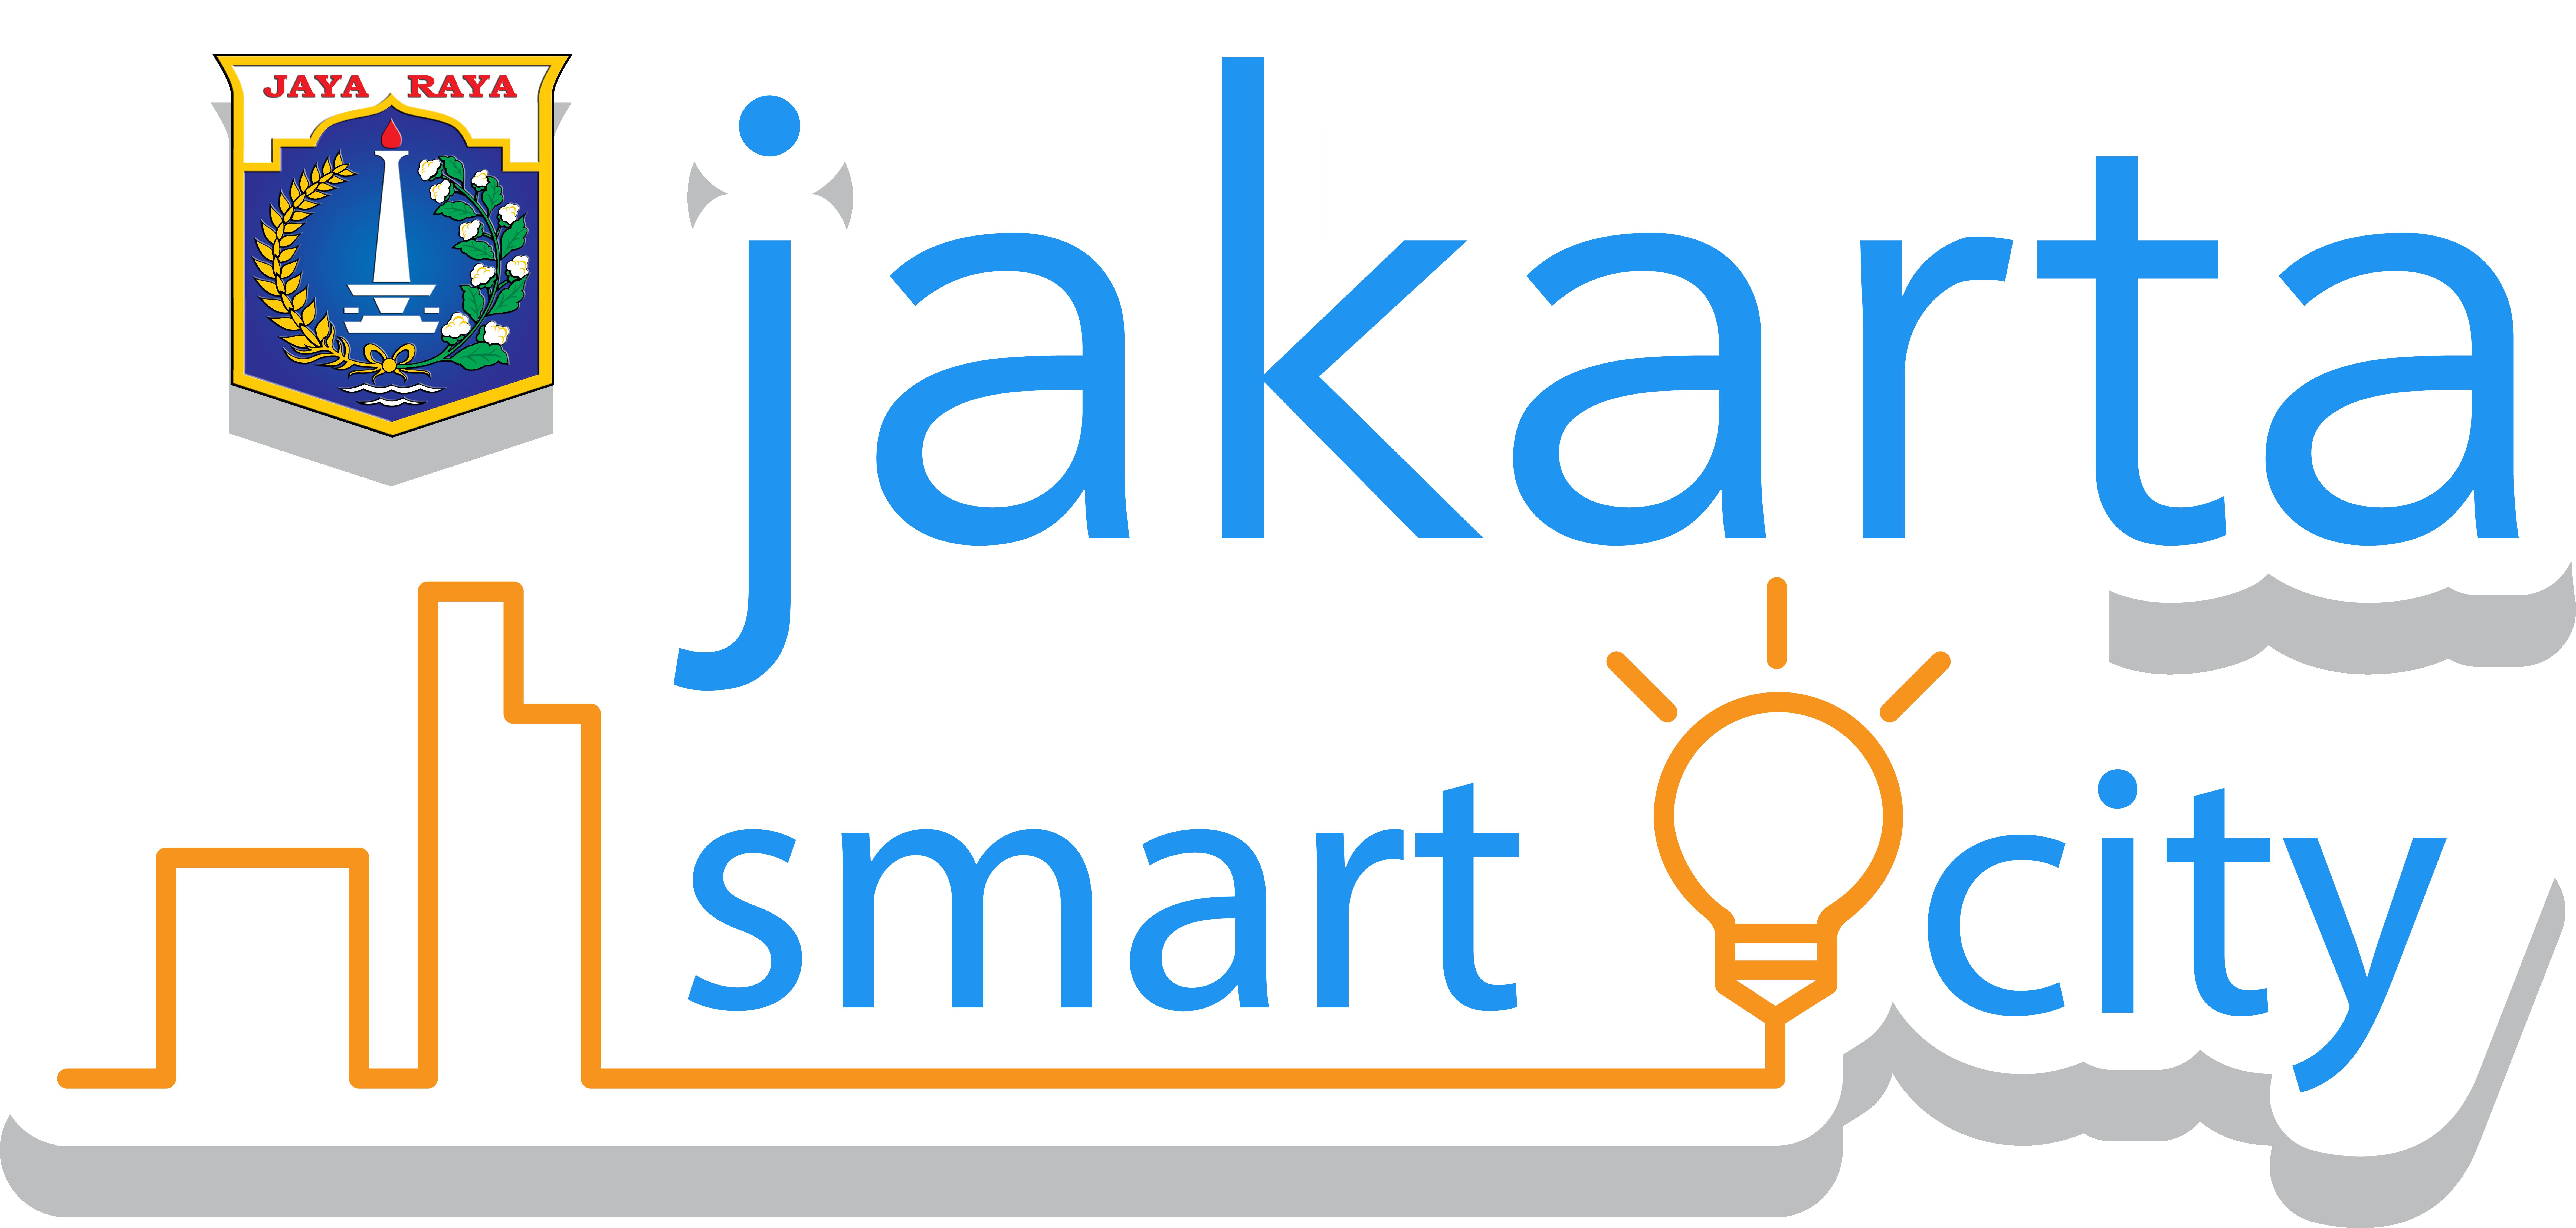 logo_jkt_smartcity_with_jayaraya